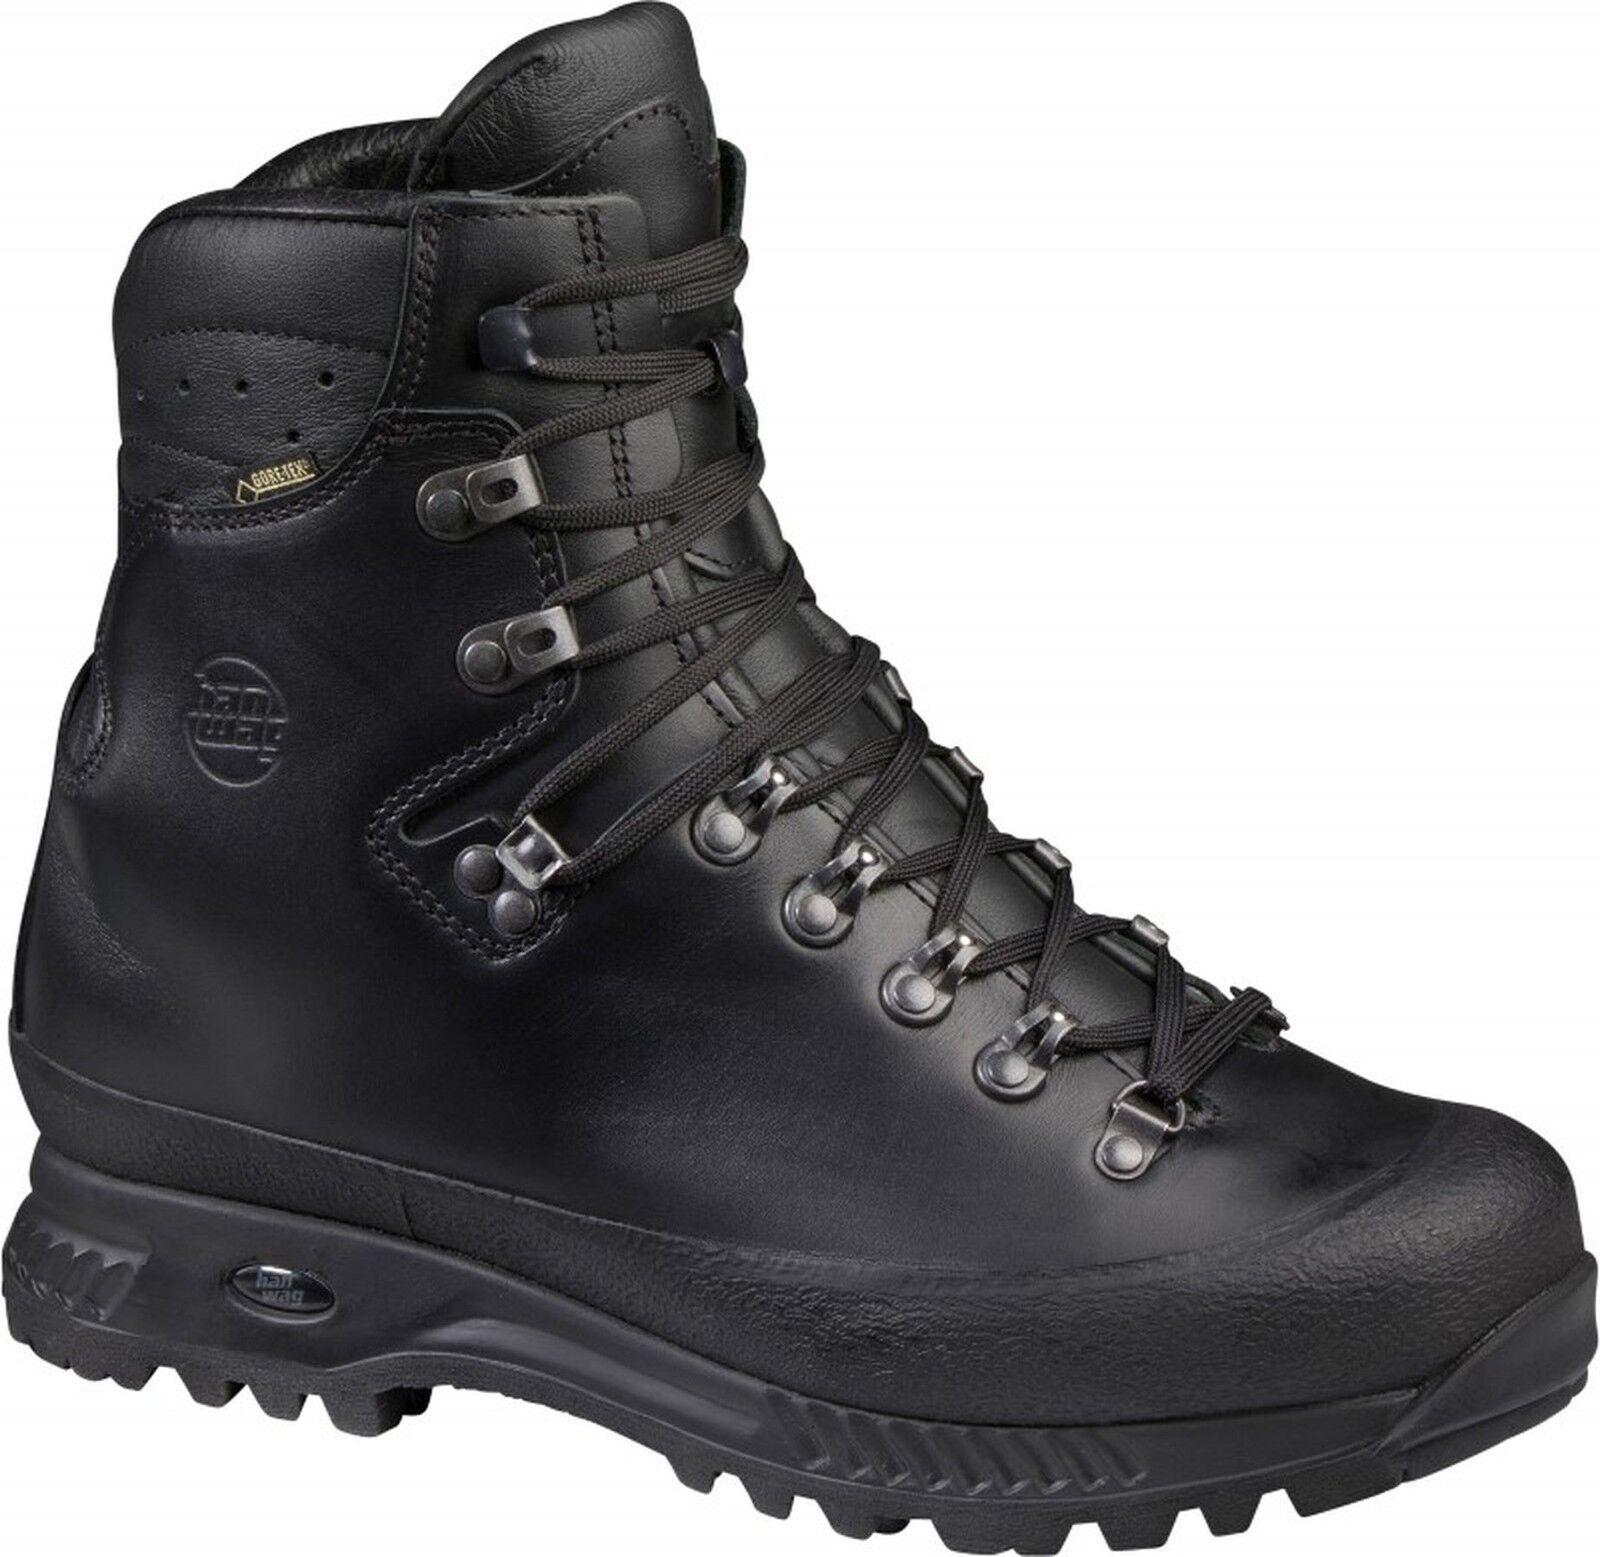 Hanwag Trekking Trekking Trekking & Bundeswehr Klassiker Alaska GTX Men Größe 7,5 - 41,5 schwarz 83bb1e